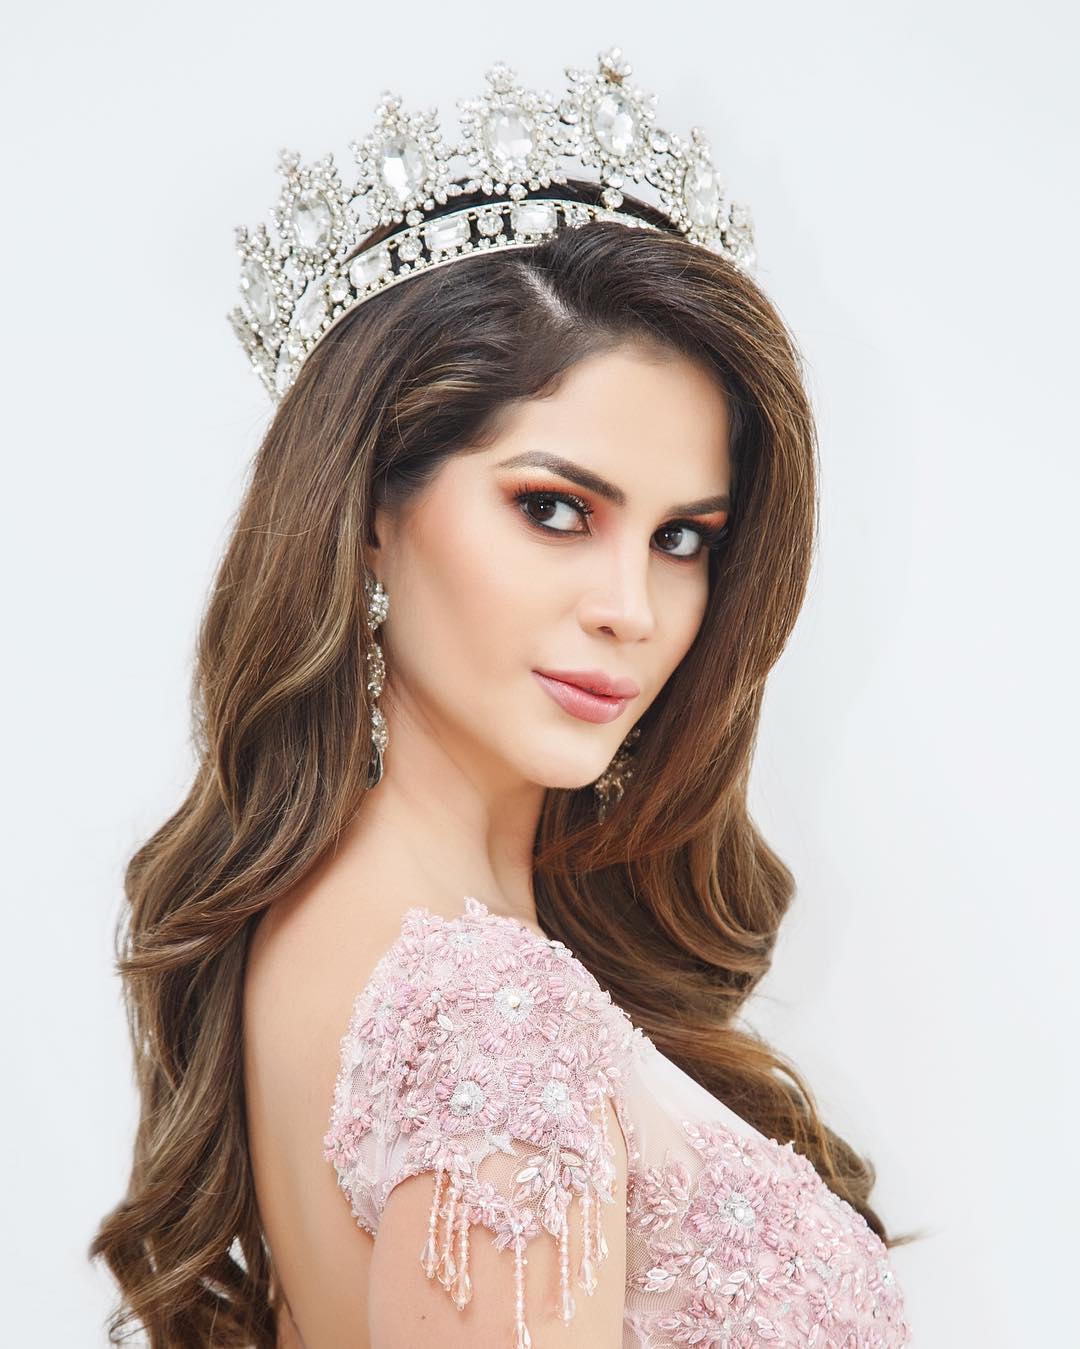 andrea moberg, top 20 de miss grand international 2018 (best national costume). - Página 3 41640110